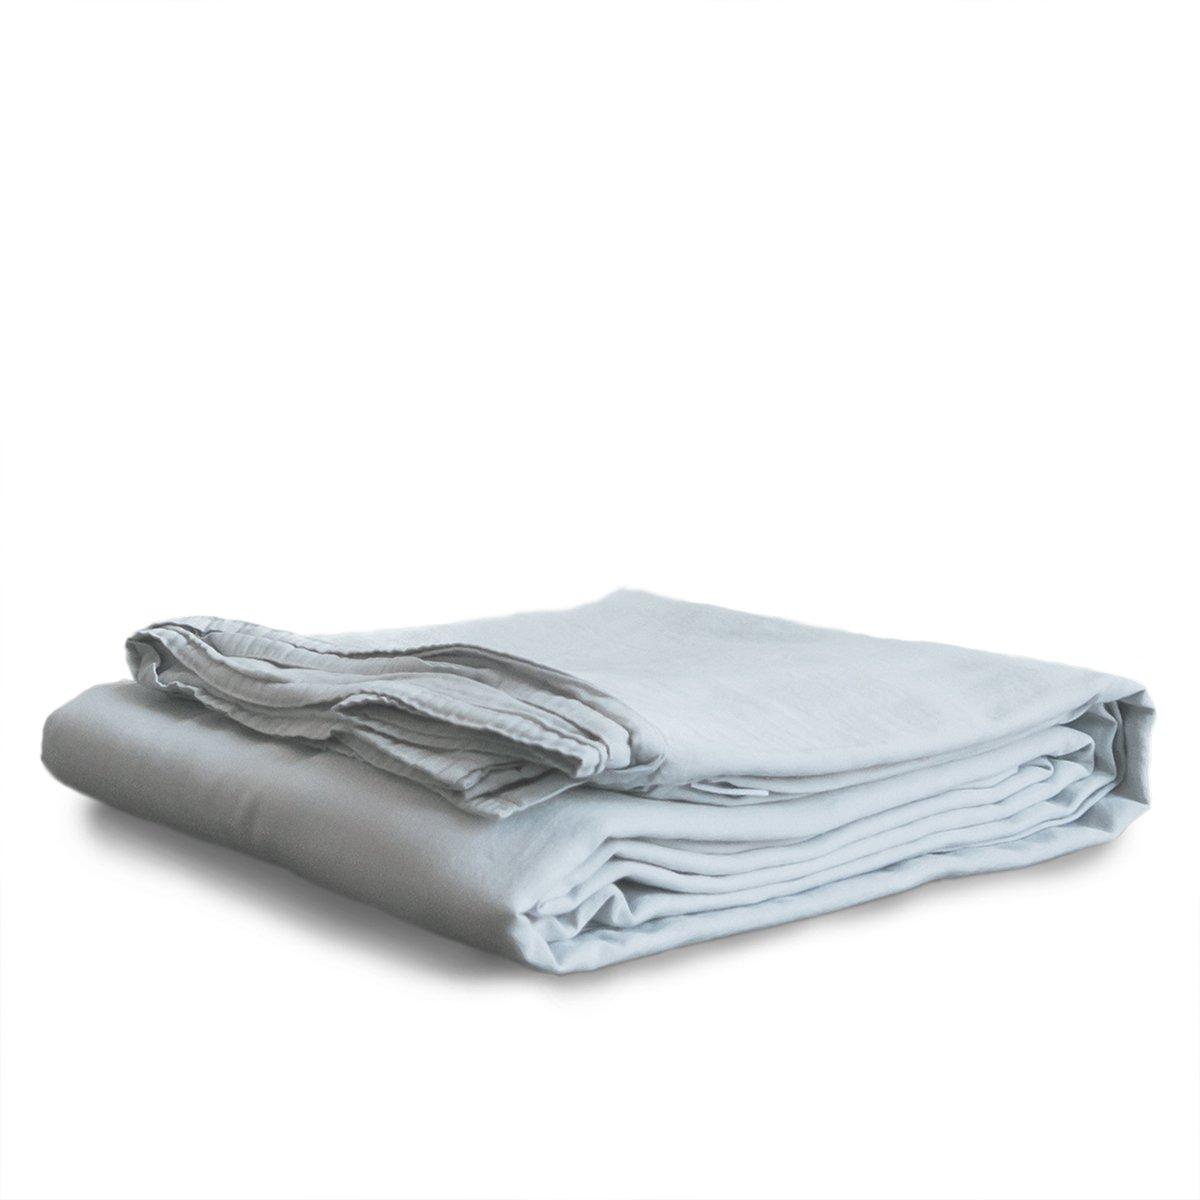 Ginkova Stonewashed Flat Sheet   100% Soft Cotton (Harbor Mist, Full/Queen)